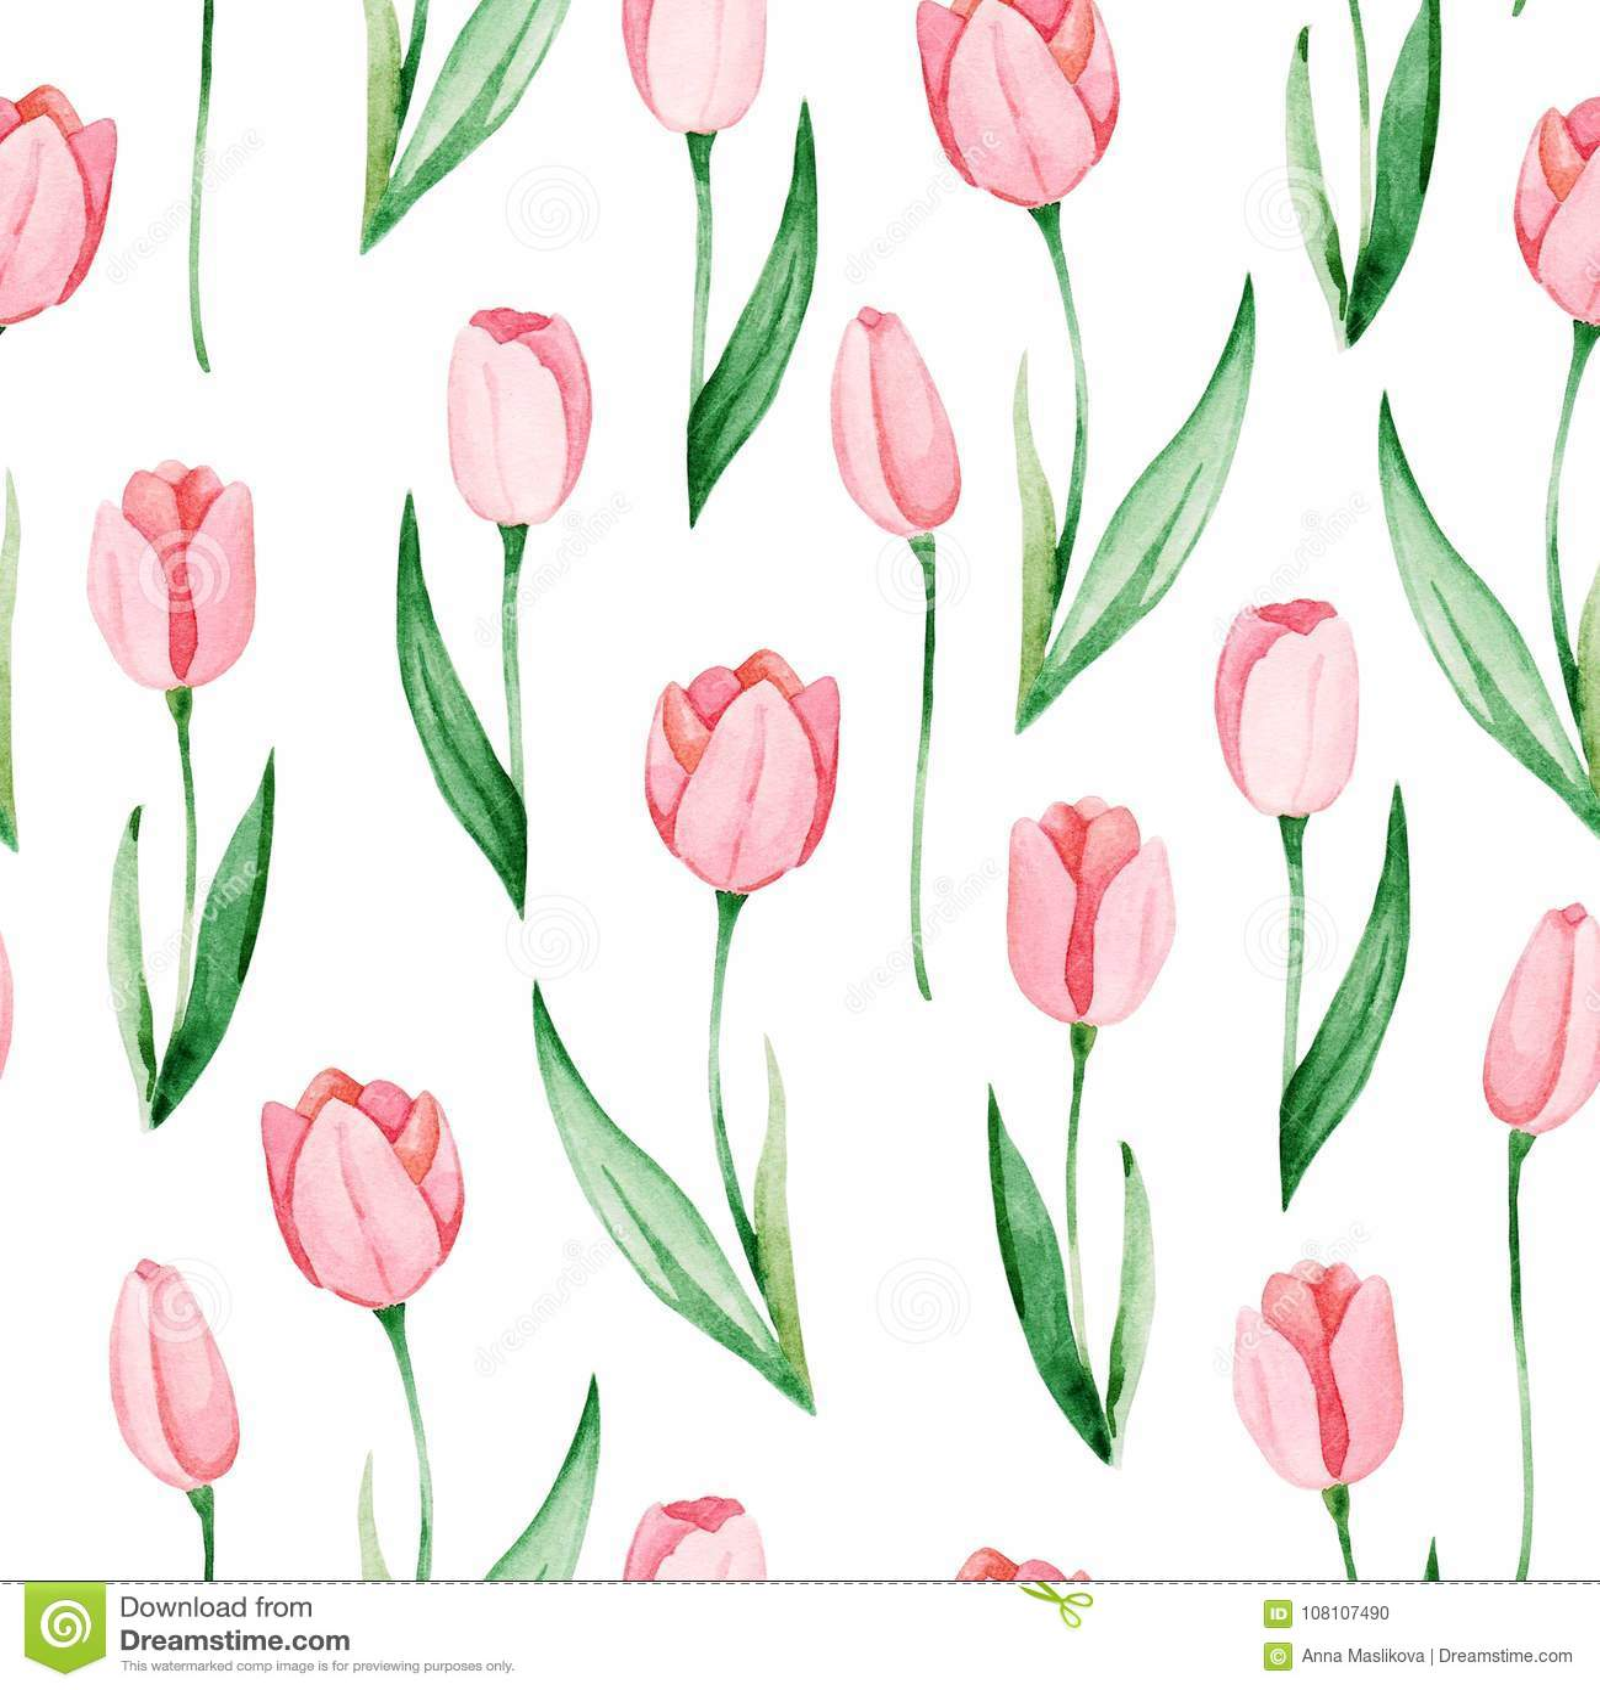 Watercolor Tulips Pattern International Women S Day For Design